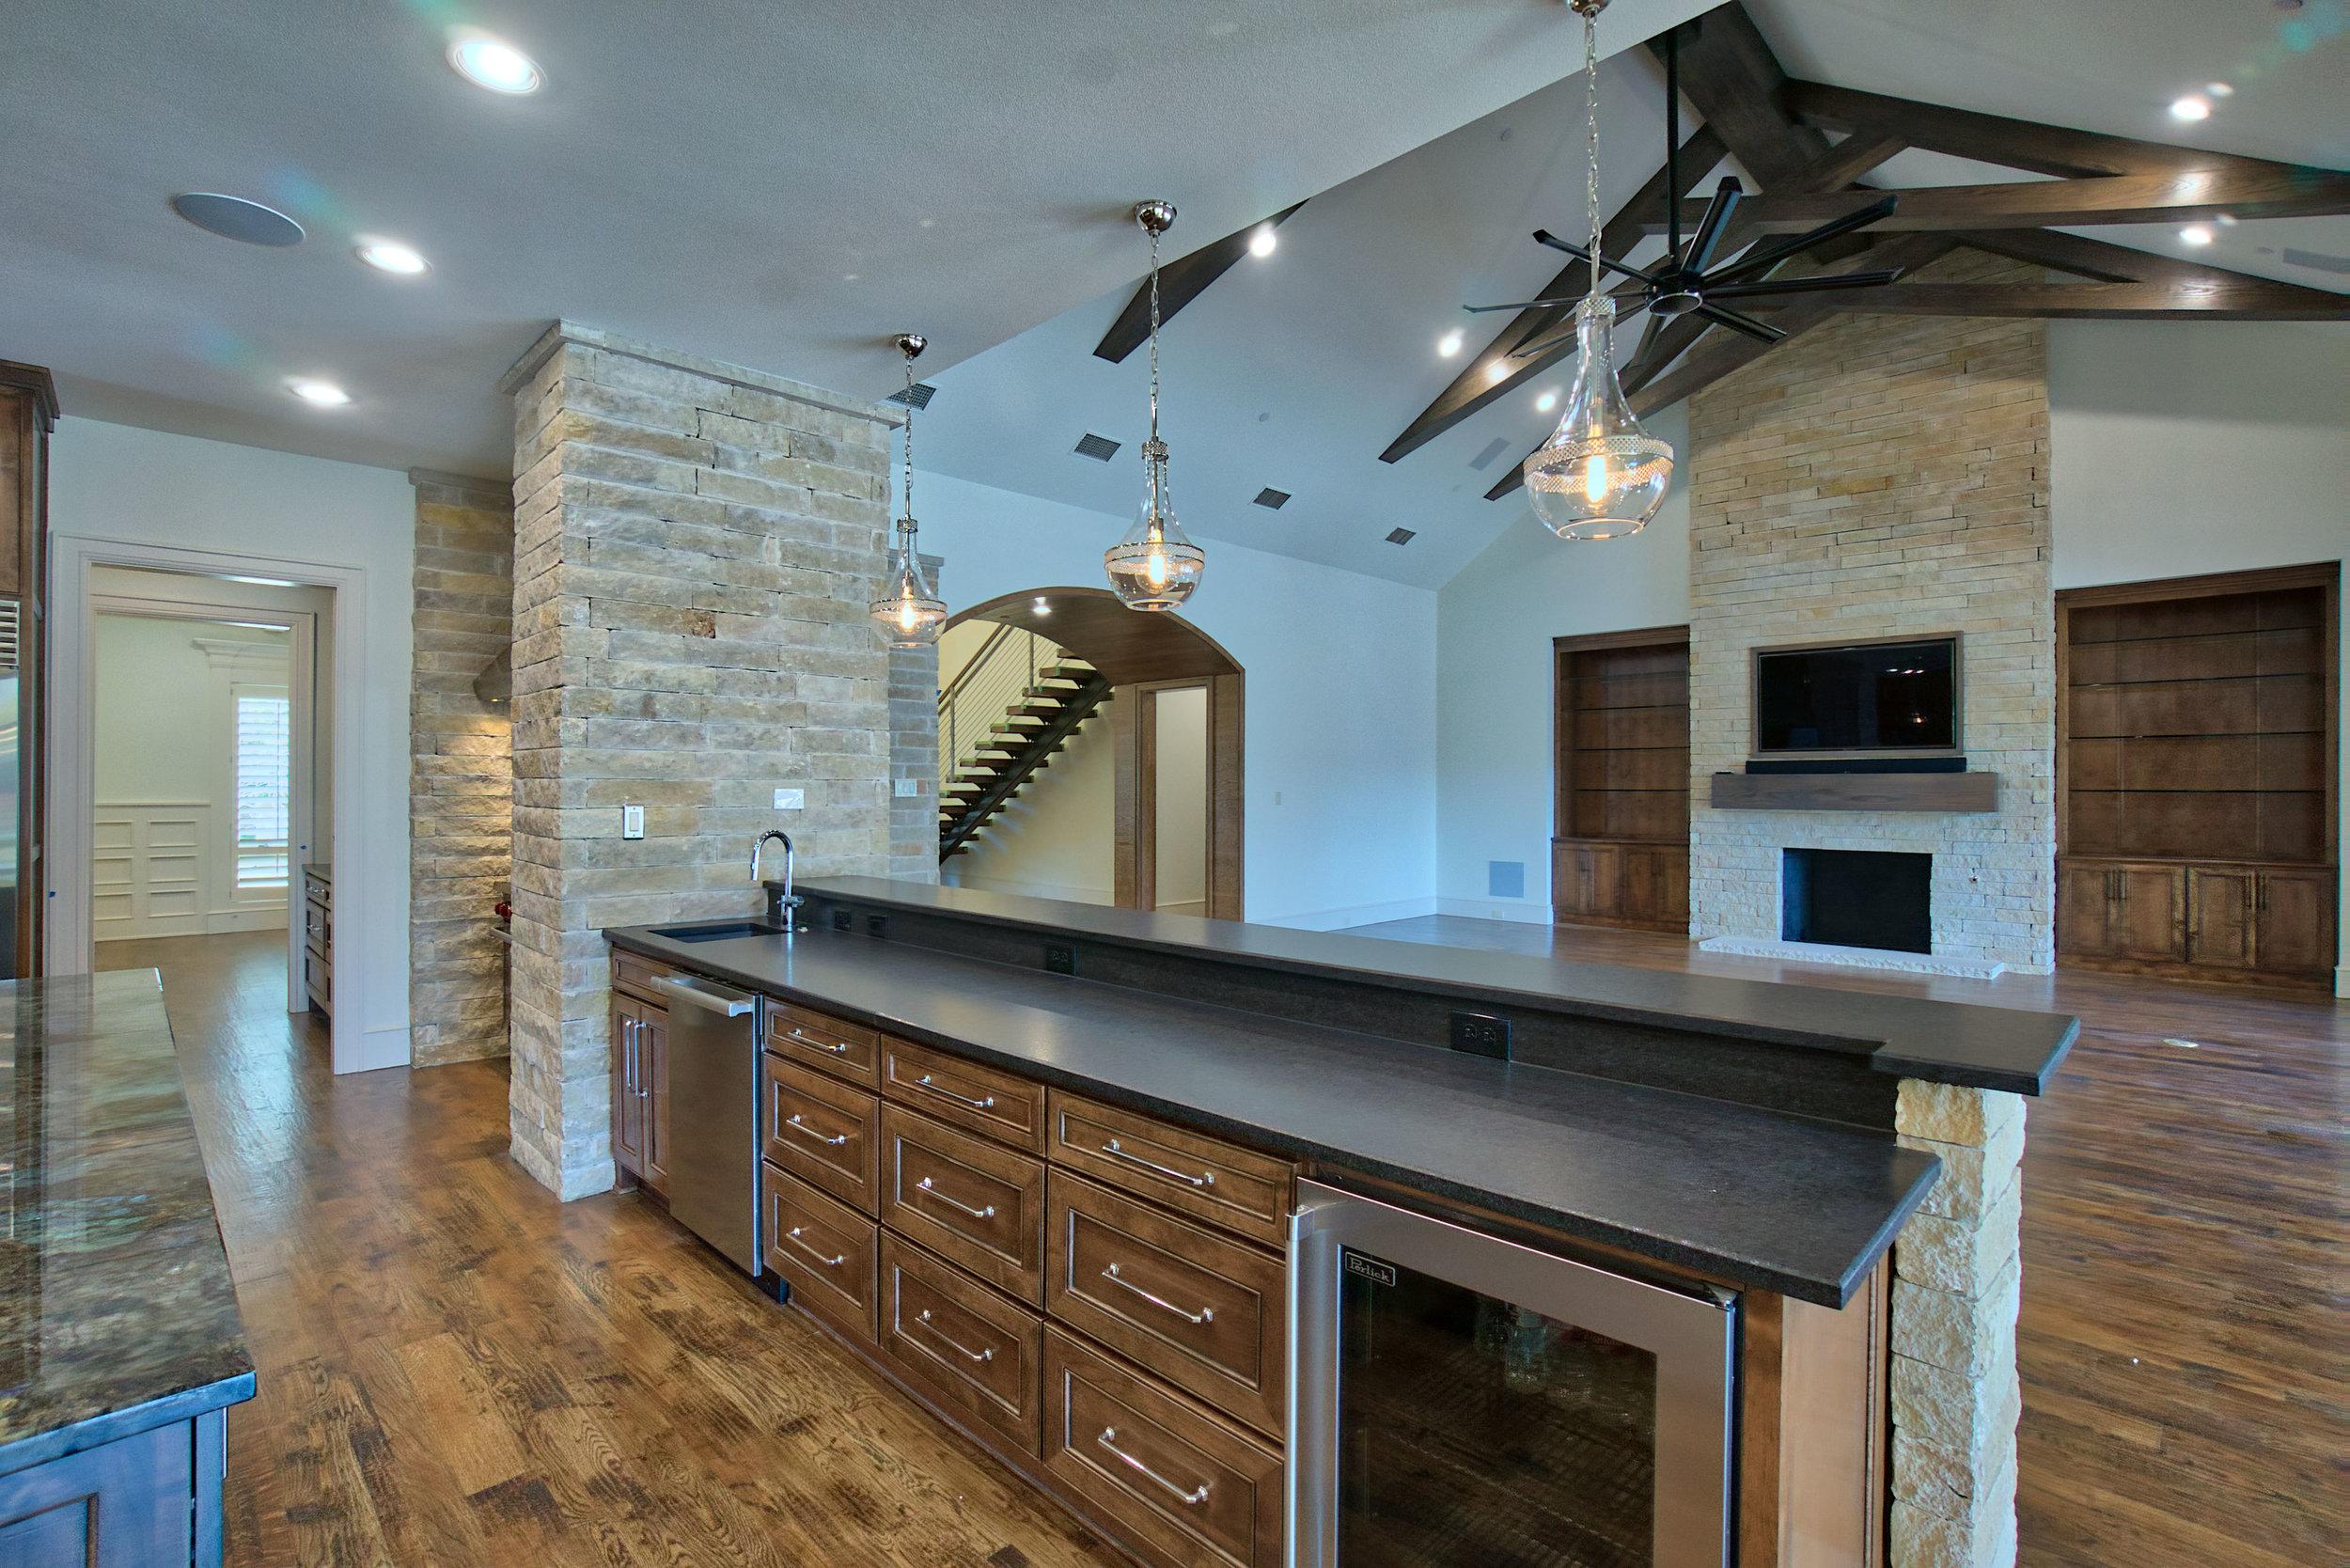 11 kitchen 4.jpeg